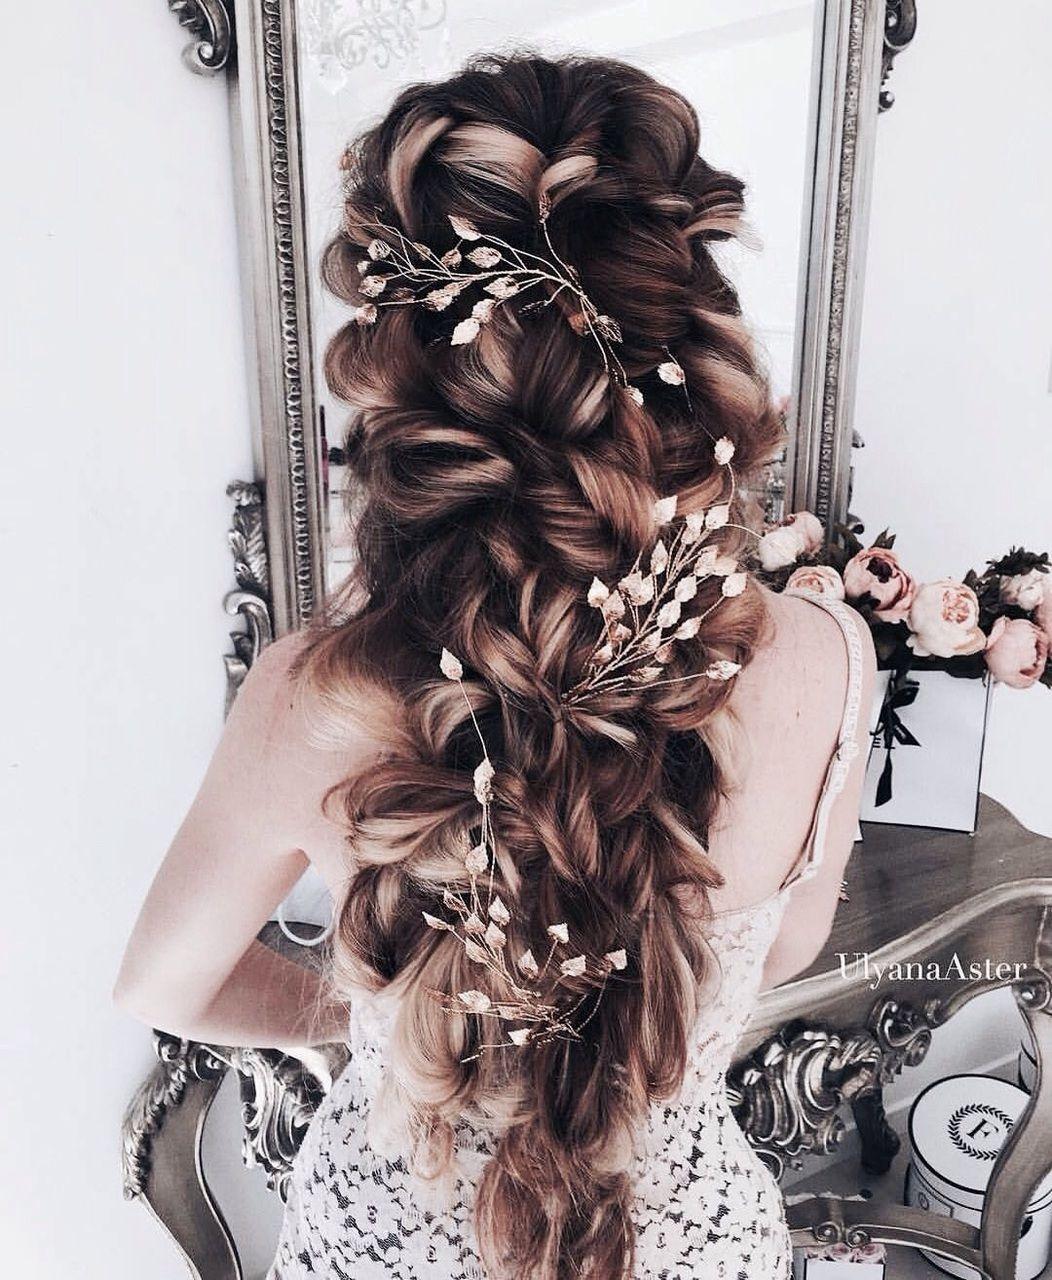 Pin by skylar proctor on hair in pinterest wedding